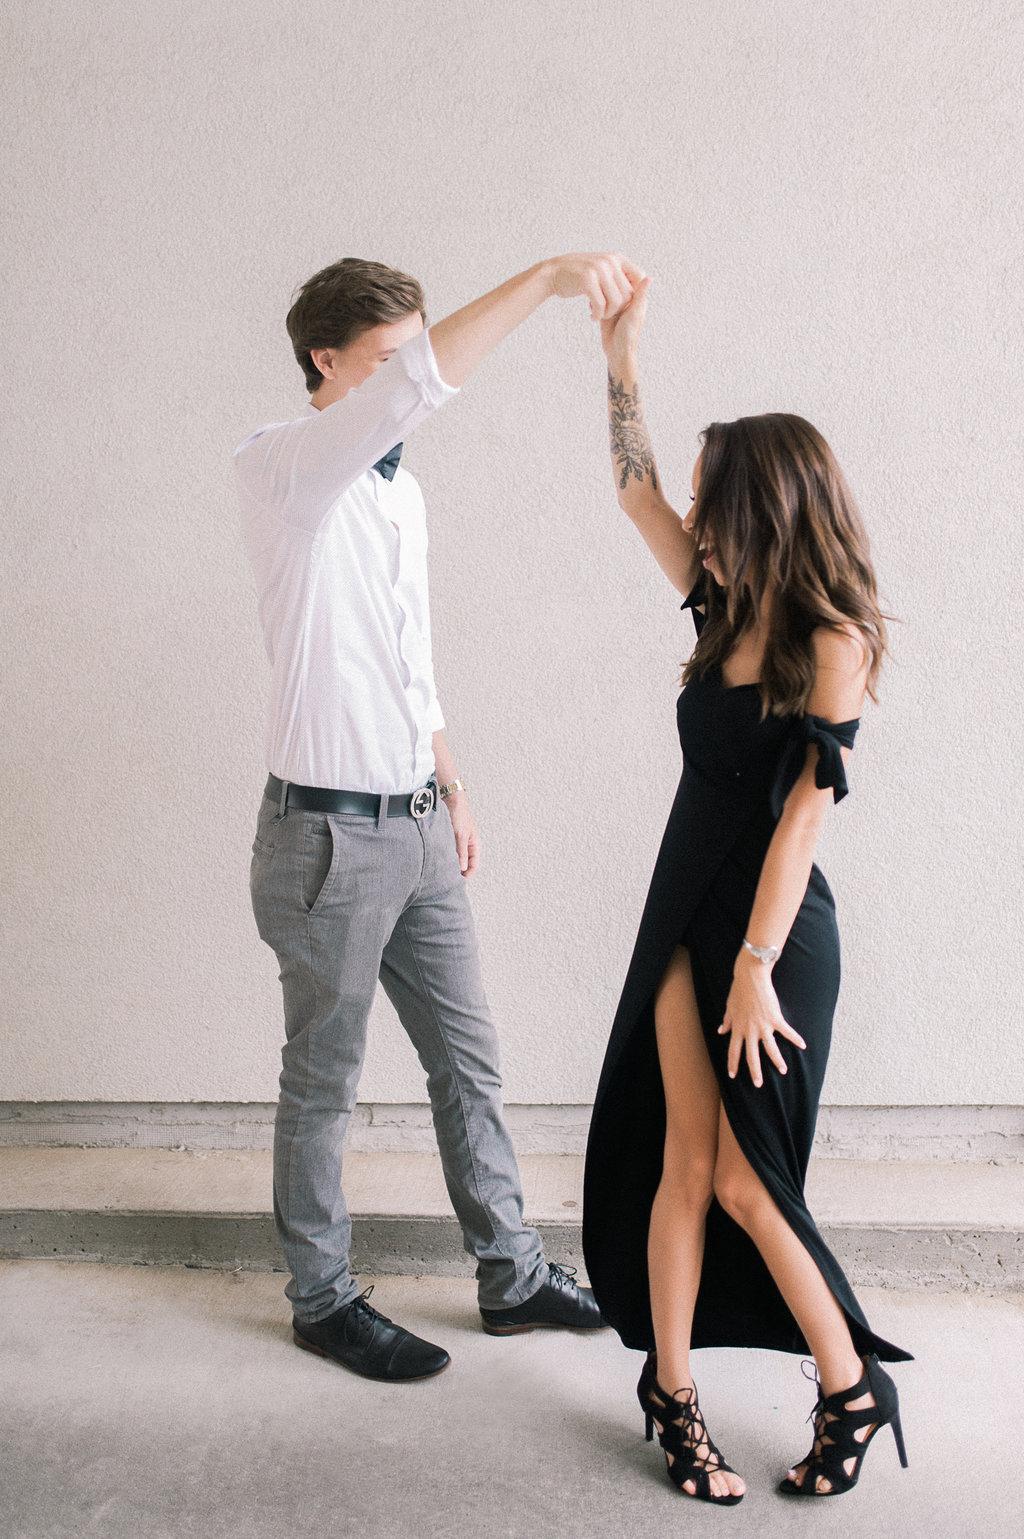 Marietta-Square-Engagement-atlanta-wedding-photographer-hannah-forsberg-7.jpg